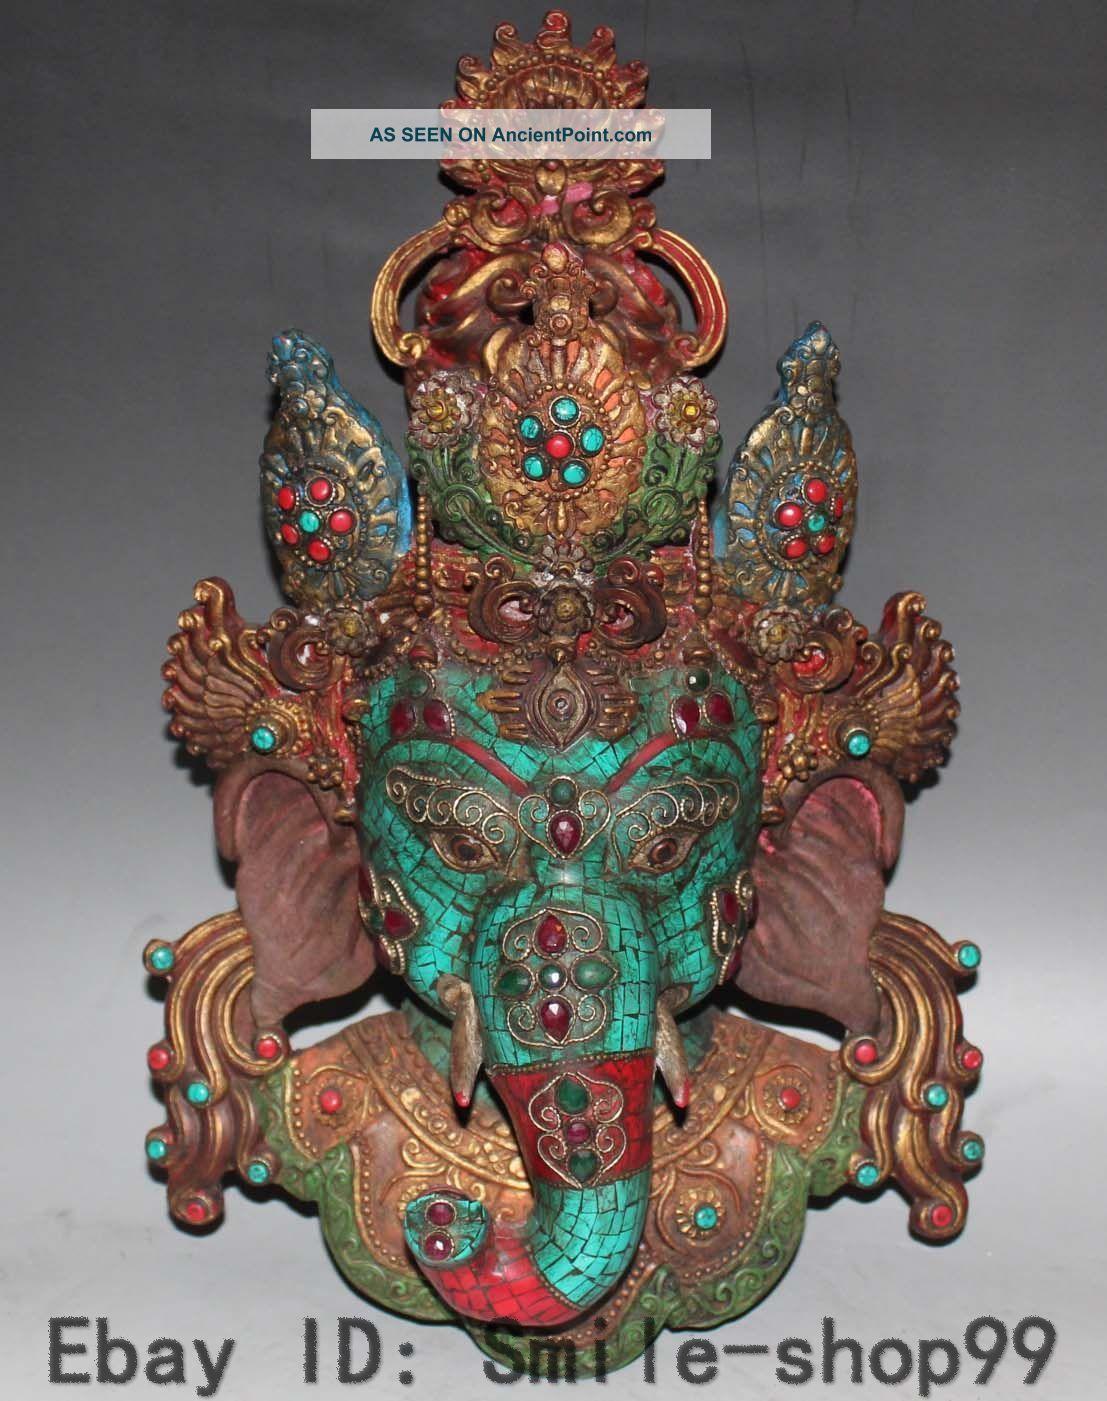 Tibetan Buddhism Turquoise & Coral Elephant Mammon God Wealth Mask Buddha Statue Buddha photo